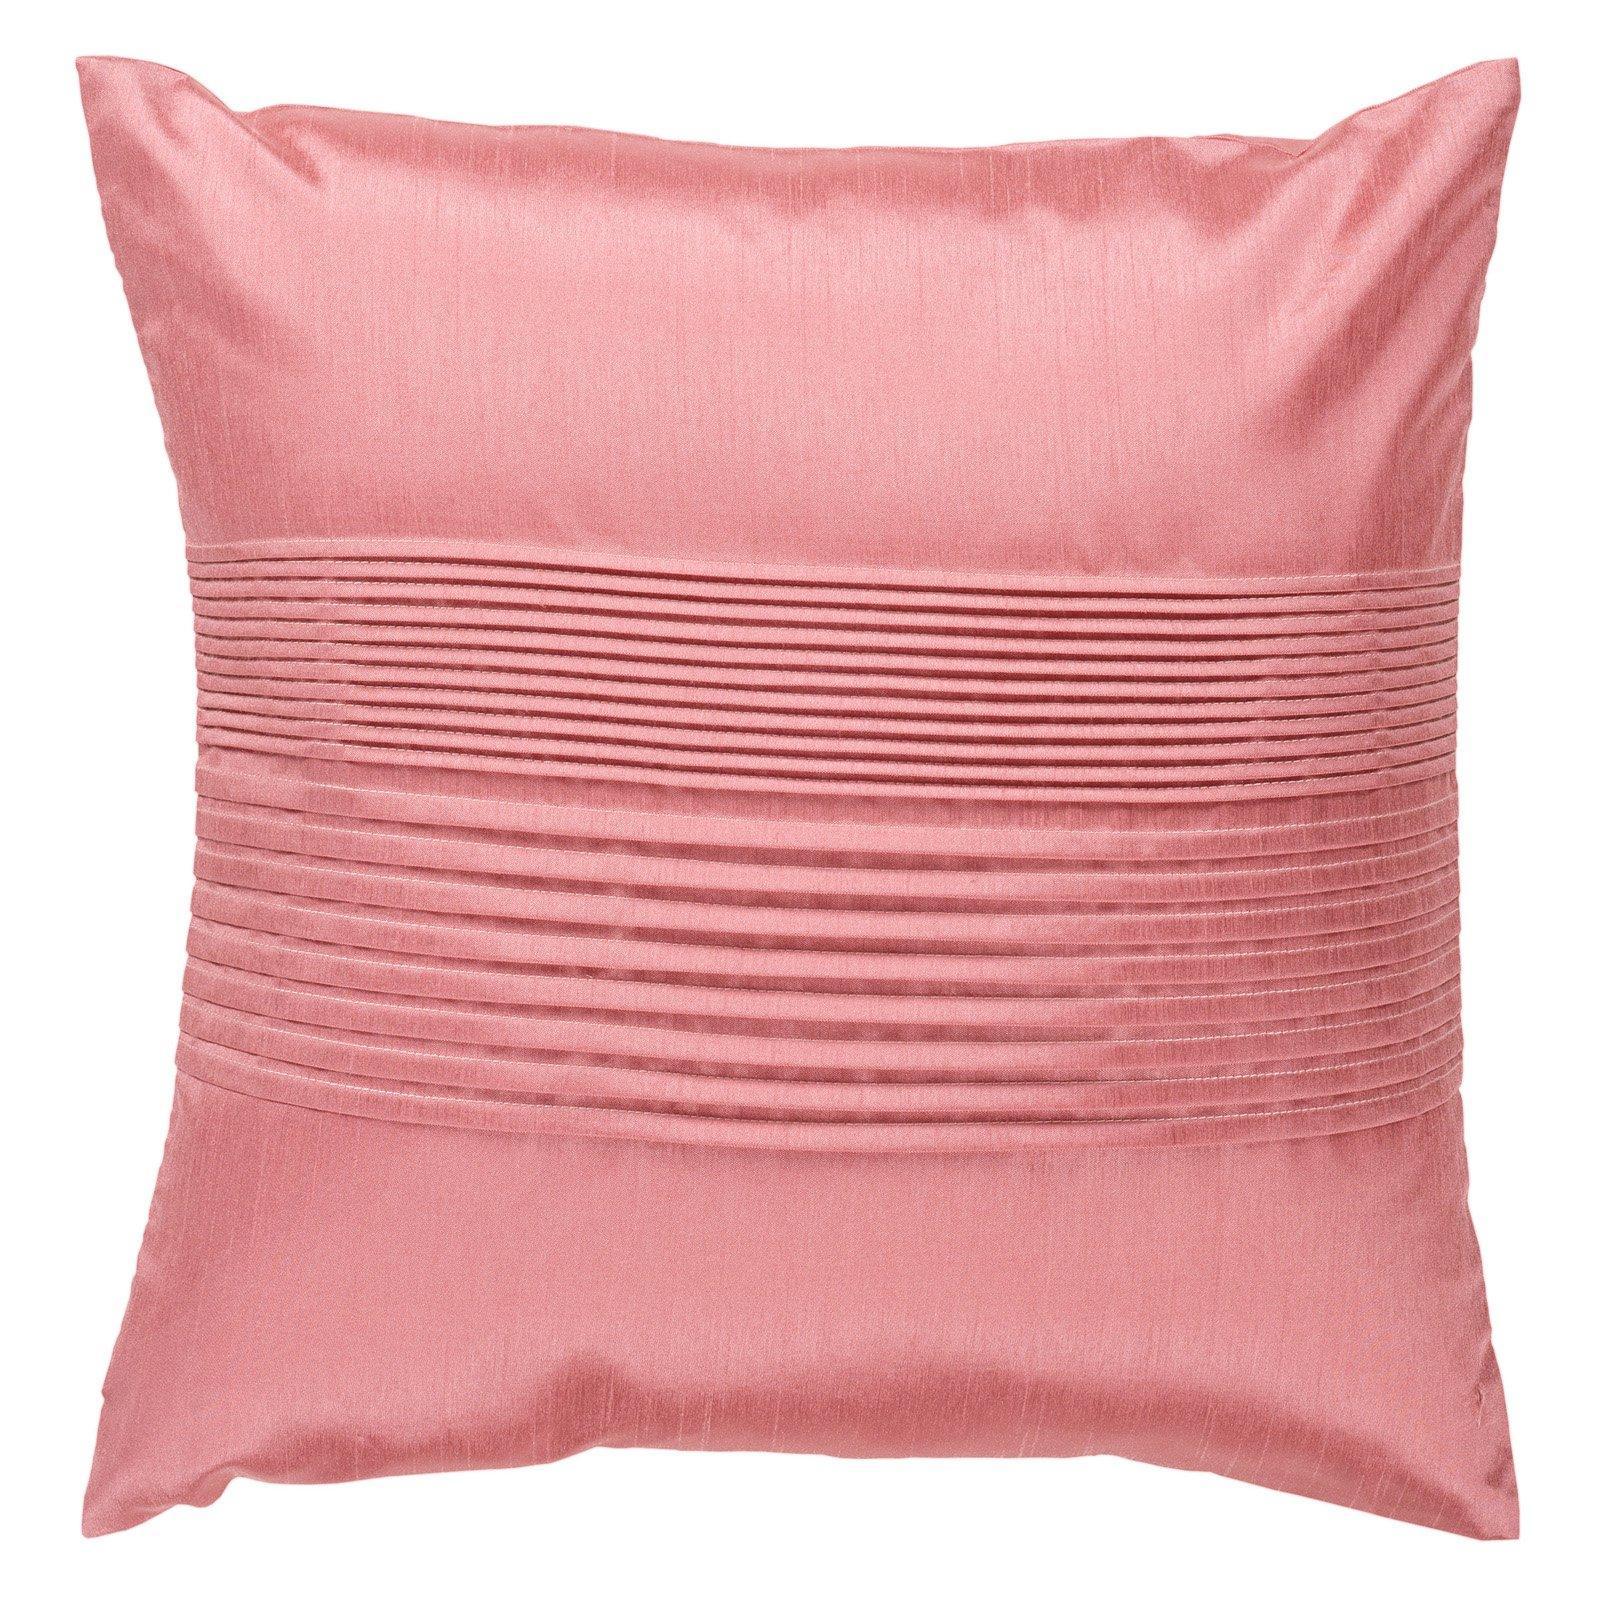 Surya Tracks Decorative Pillow - Salmon